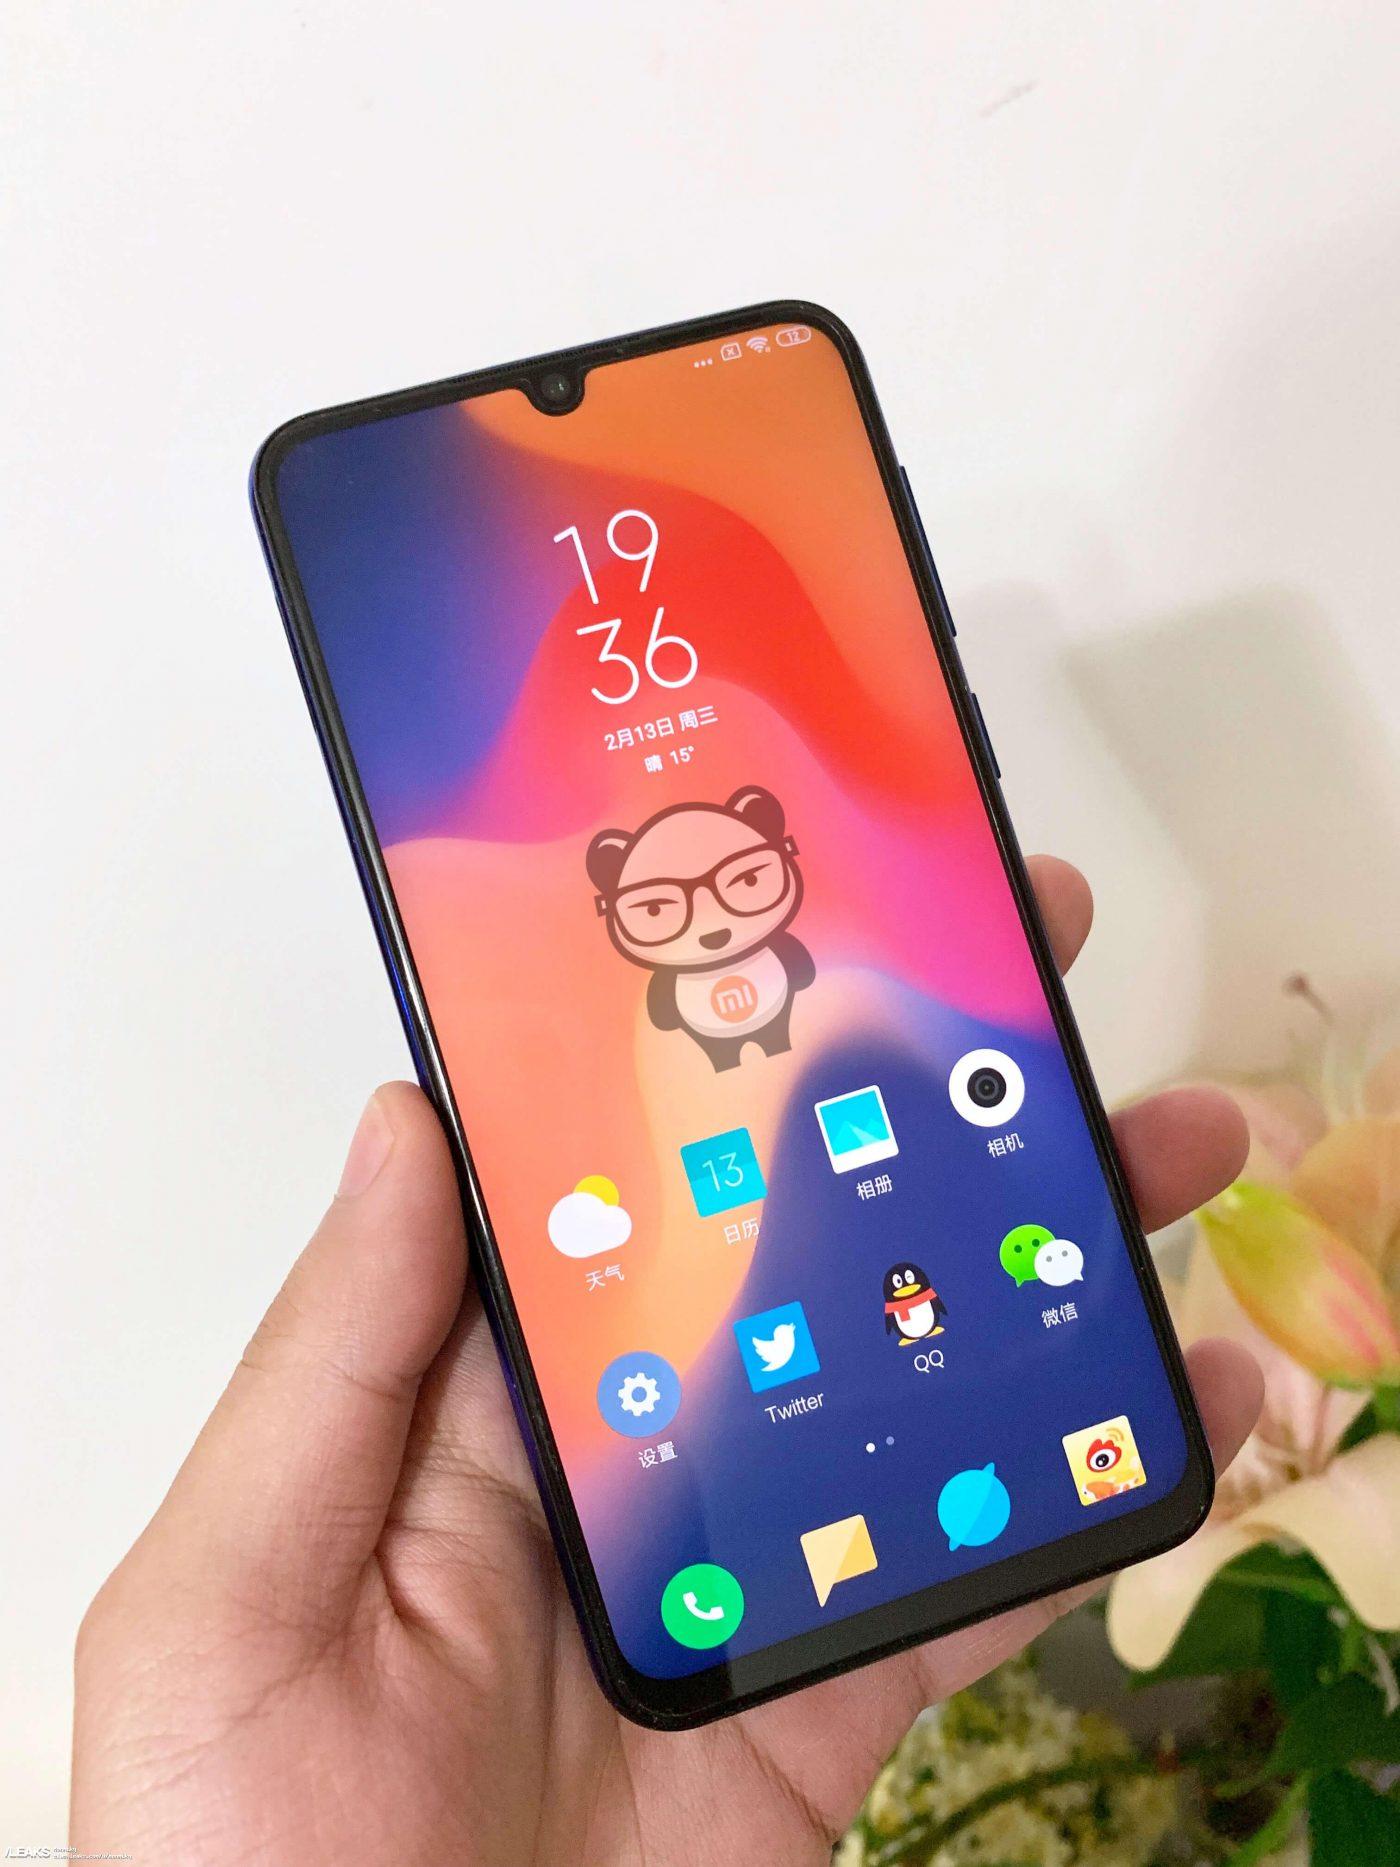 Xiaomi Mi 9 To Debut Next Week Alongside Samsung's Galaxy S10 9